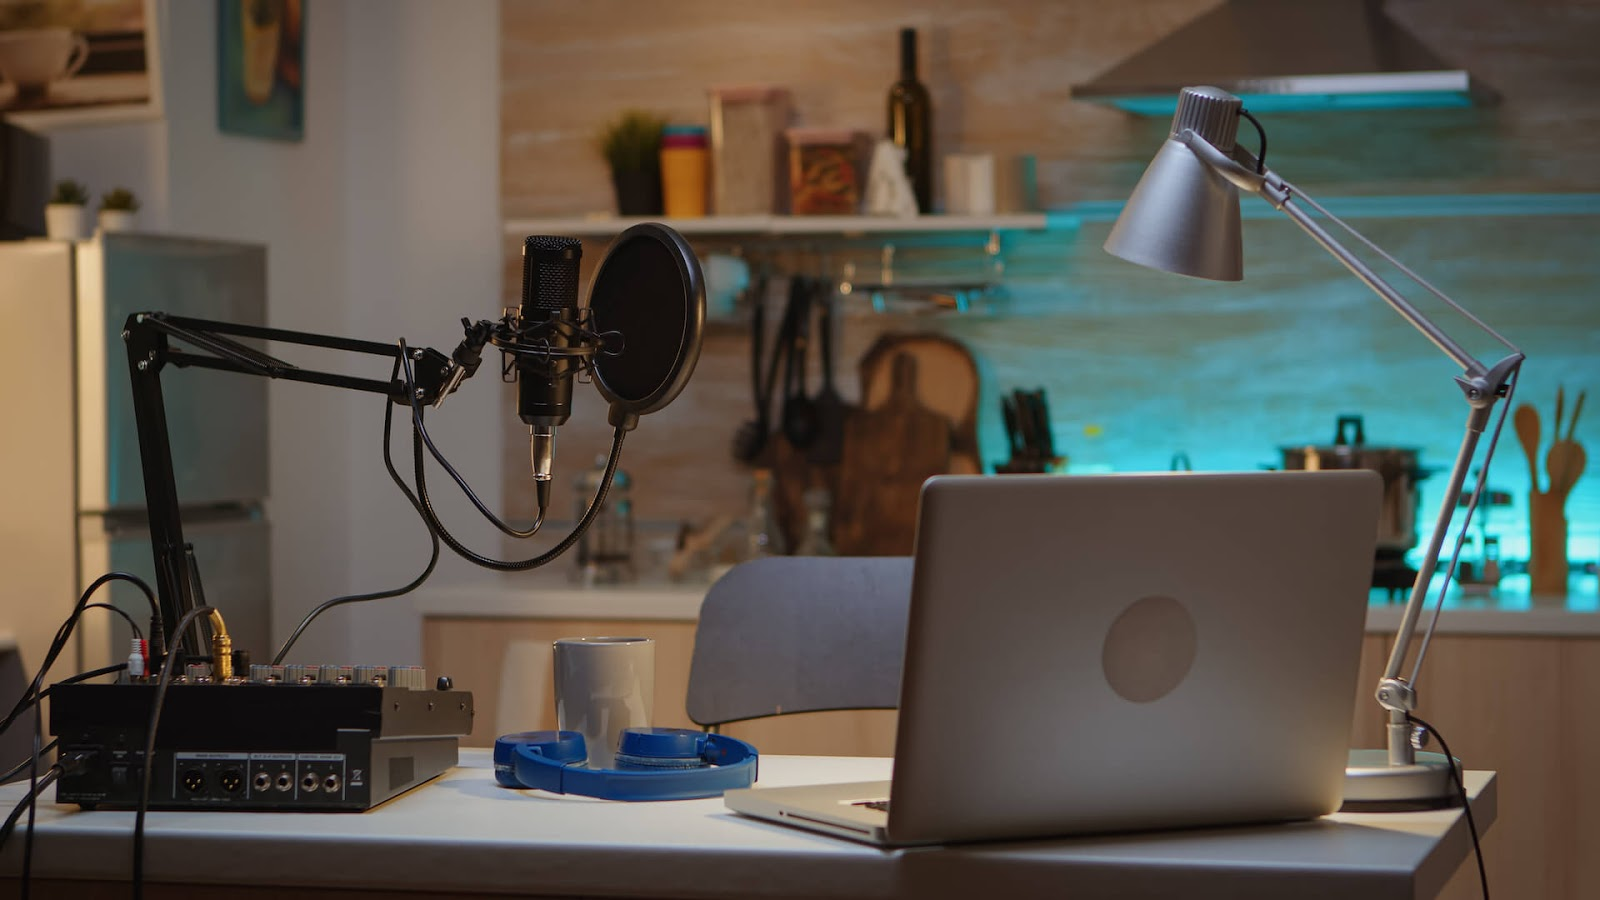 Home studio for podcasting